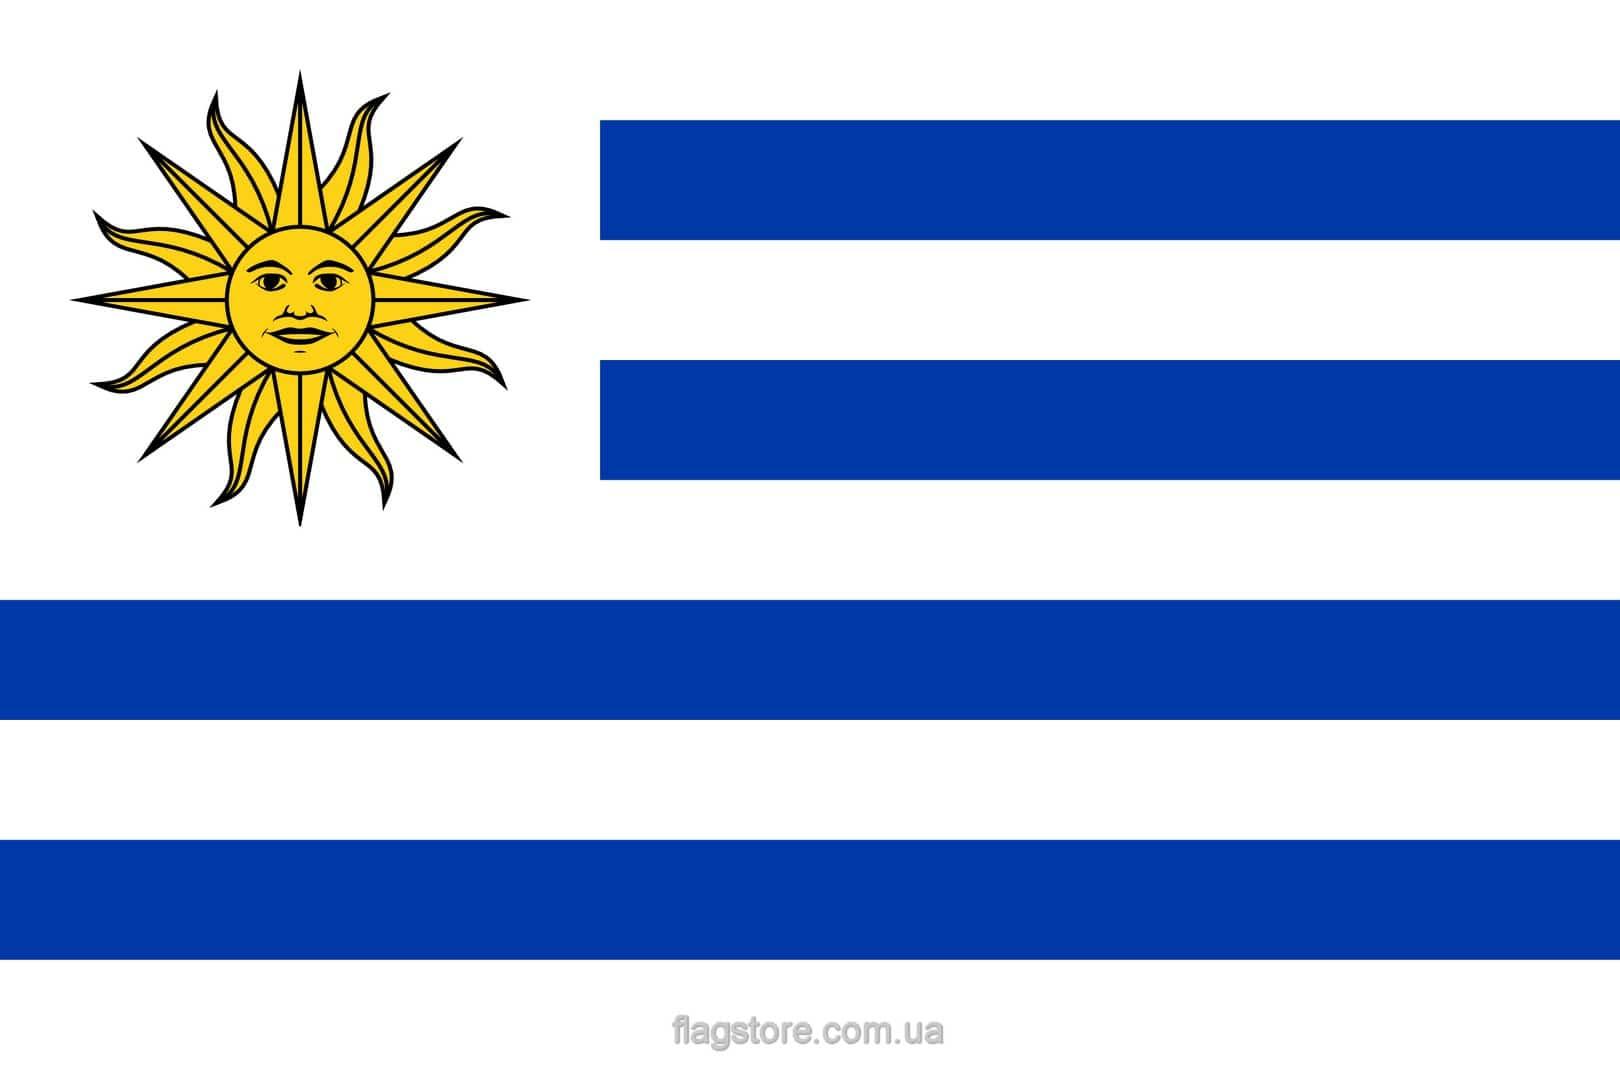 Купить флаг Уругвая (страны Уругвай)